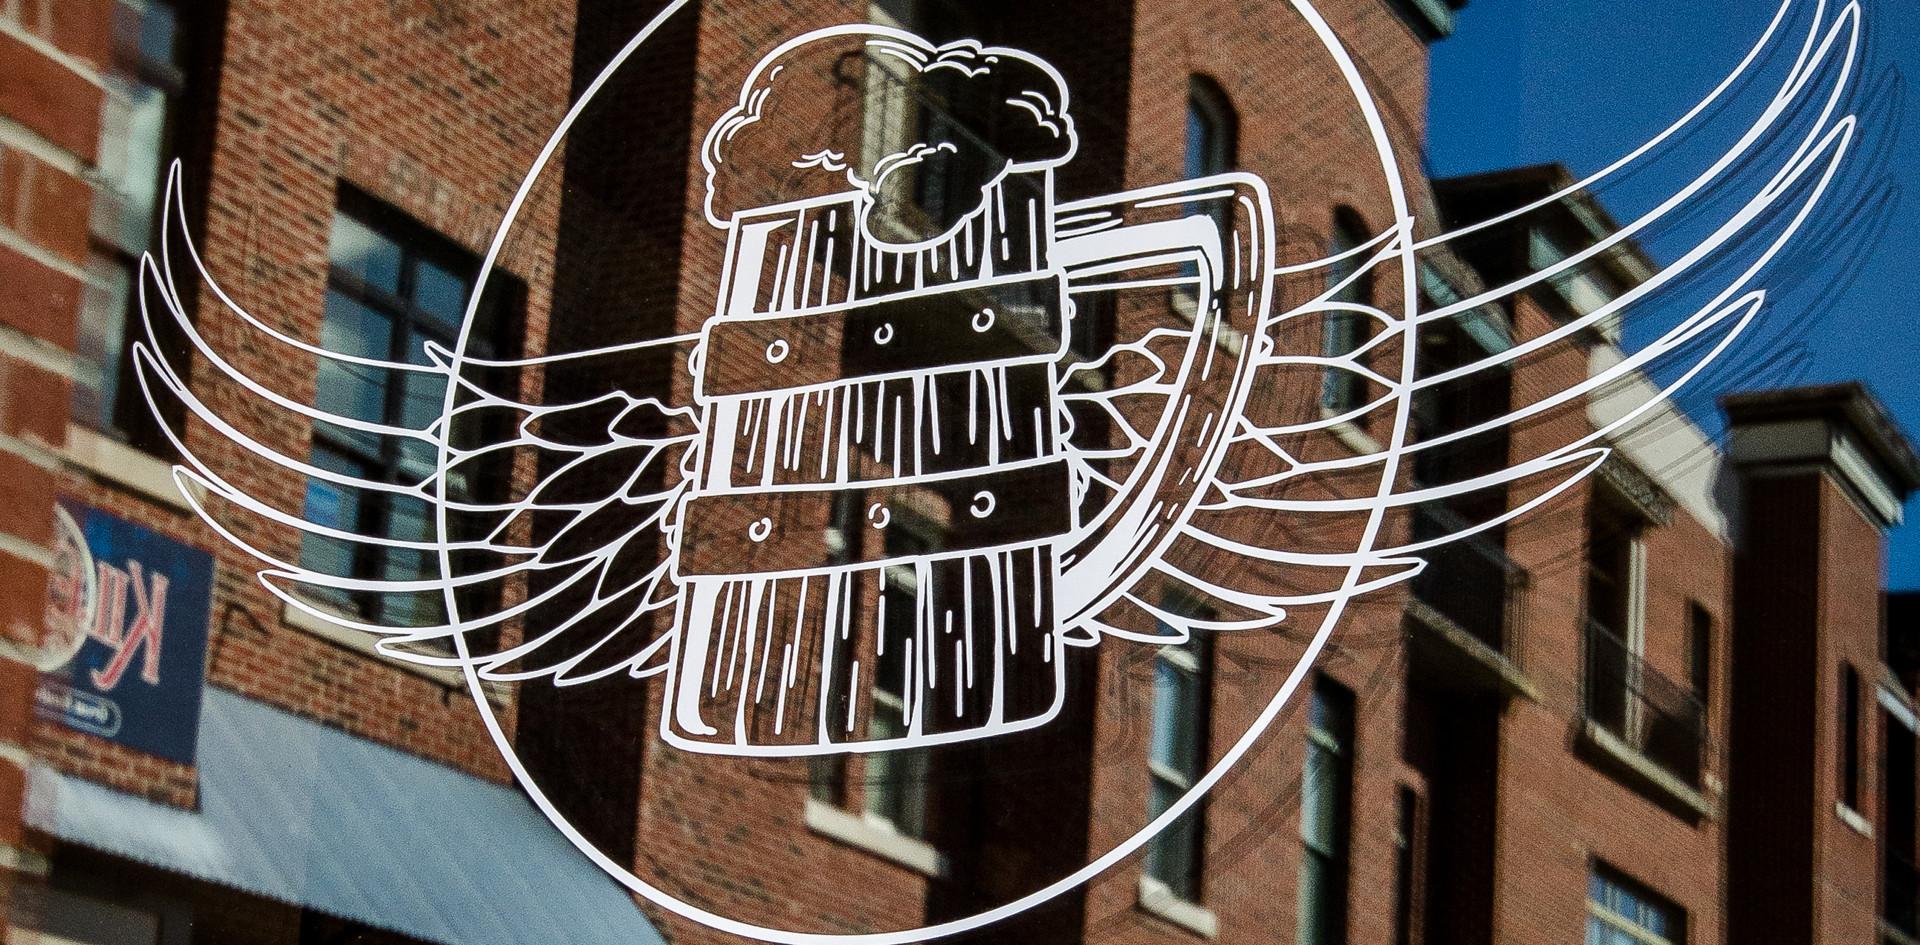 Flytes Brewery